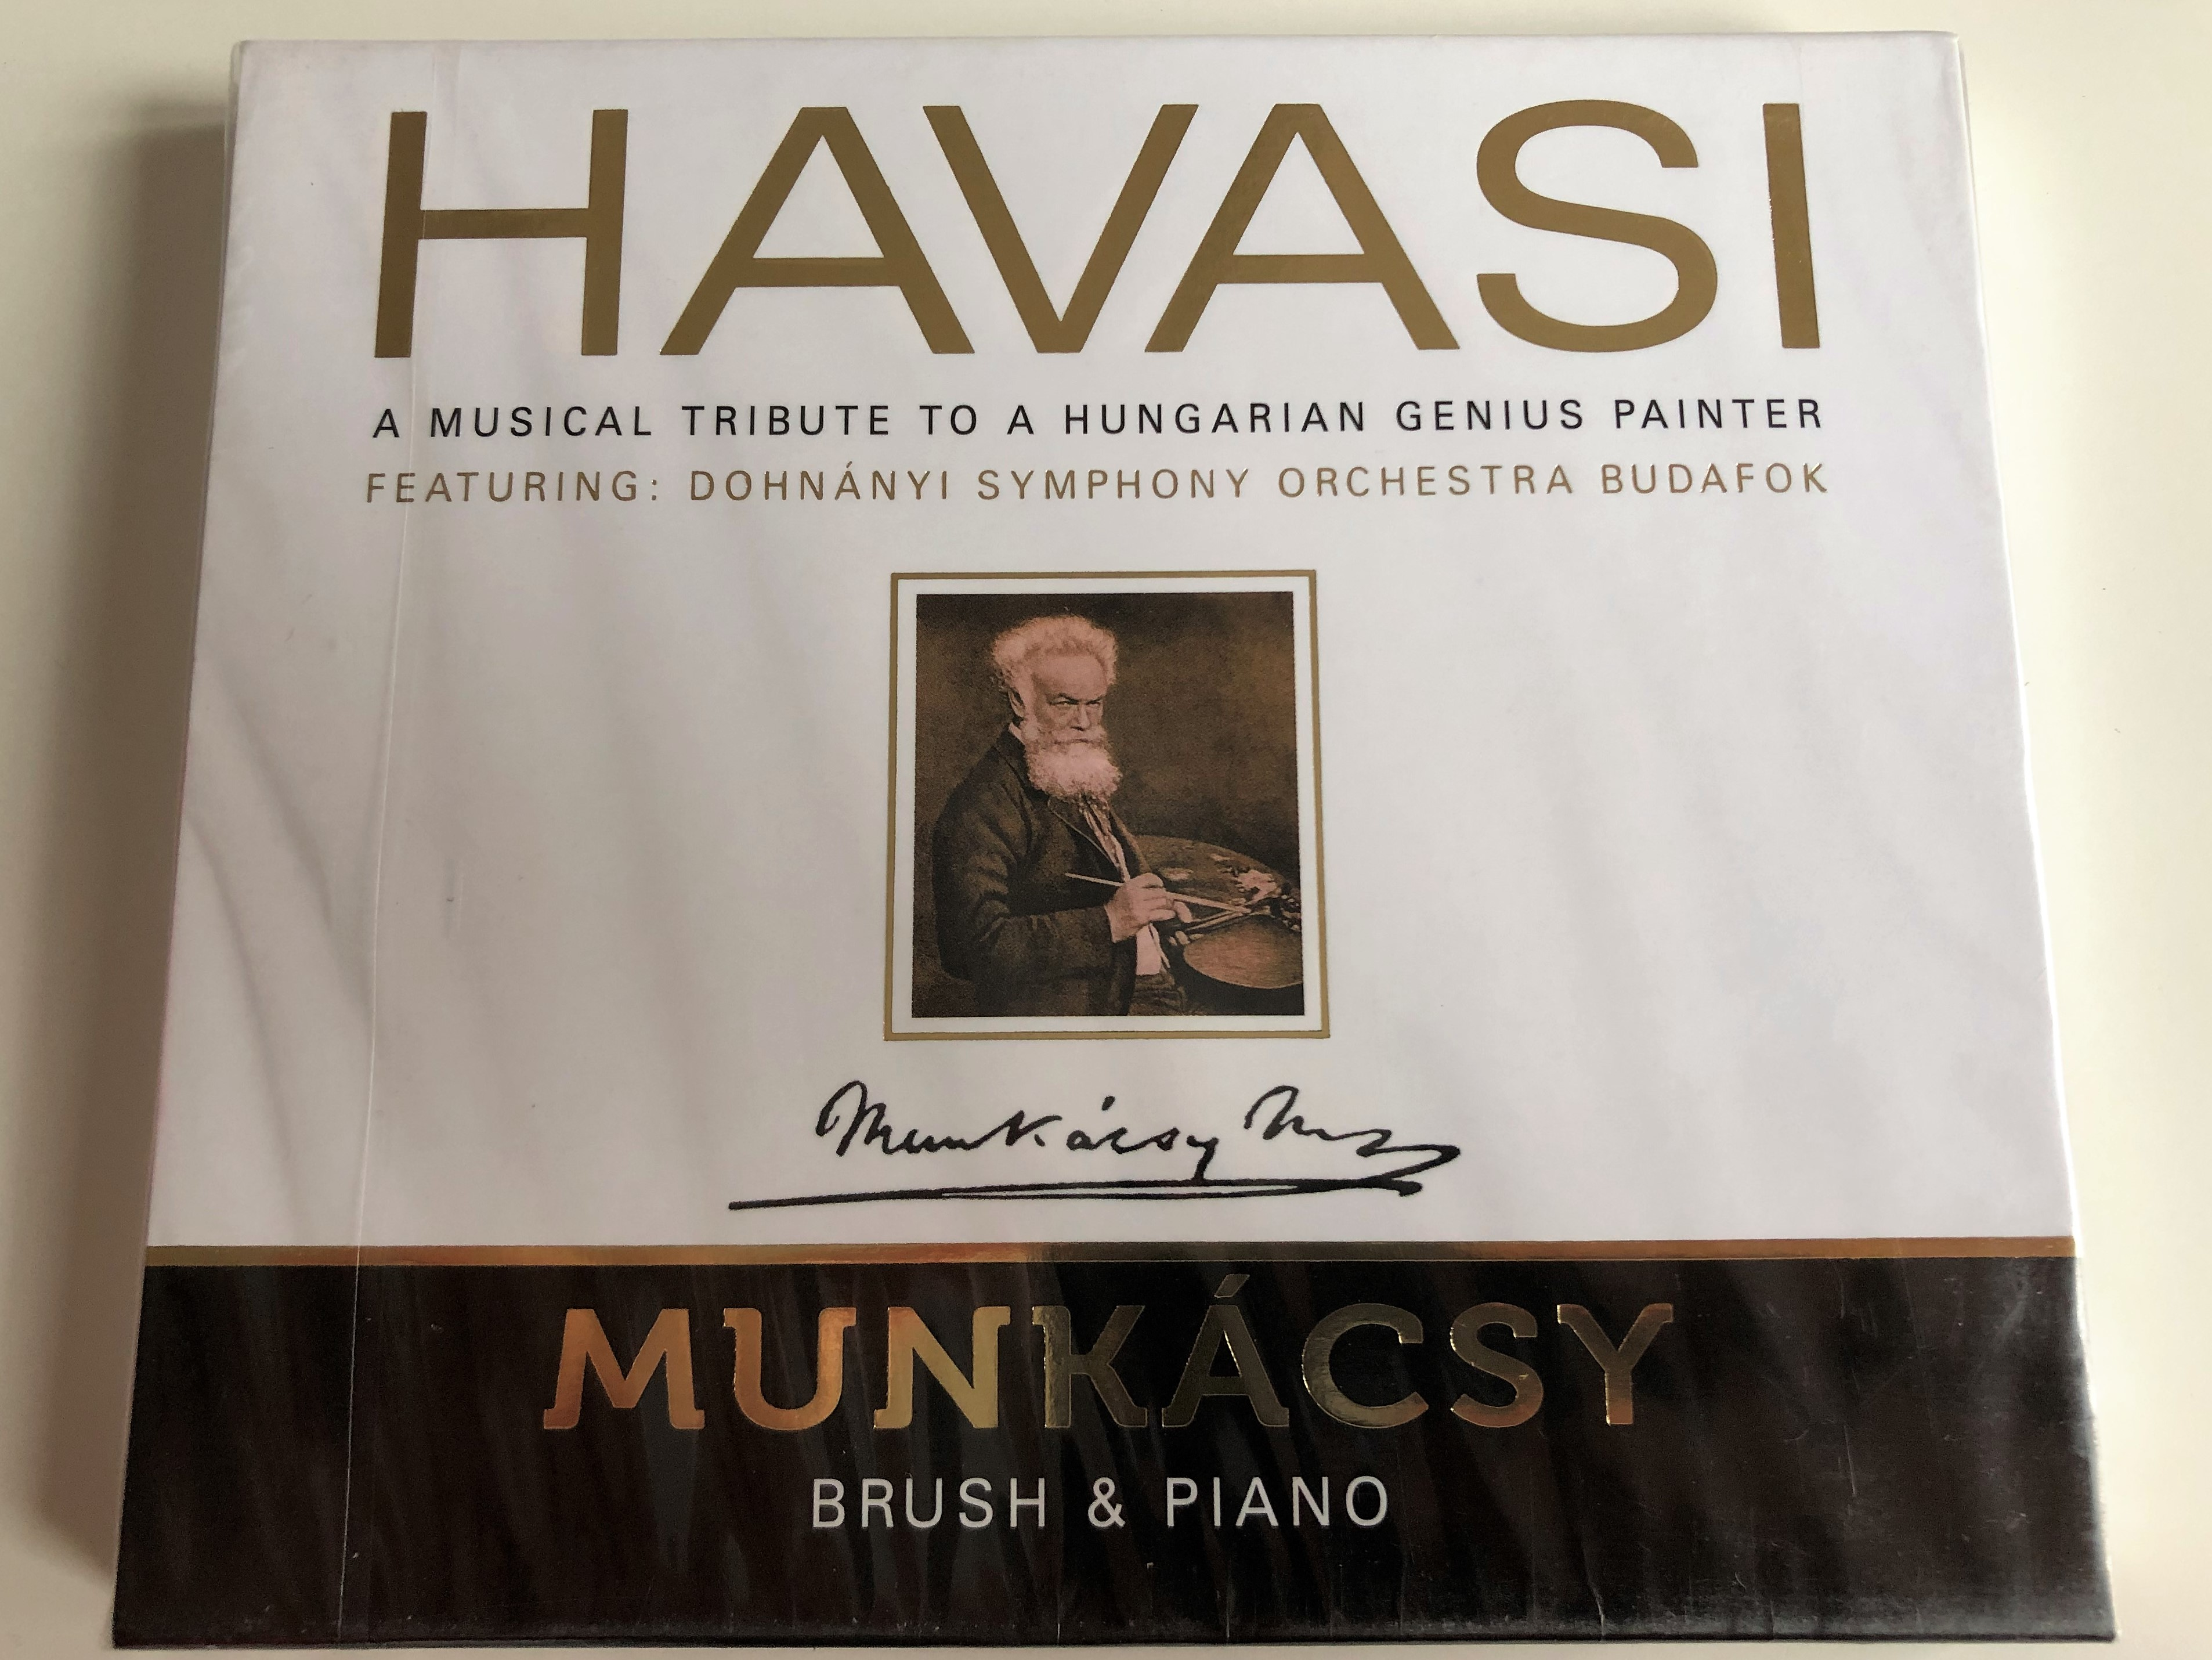 havasi-bal-zs-brush-piano-musical-tribute-to-hungarian-genius-painter-munk-csy-mih-ly-featuring-dohn-nyi-symphony-orchestra-budafok-audio-cd-2012-zenei-tisztelg-s-a-magyar-fest-g-niusz-el-tt-1-.jpg